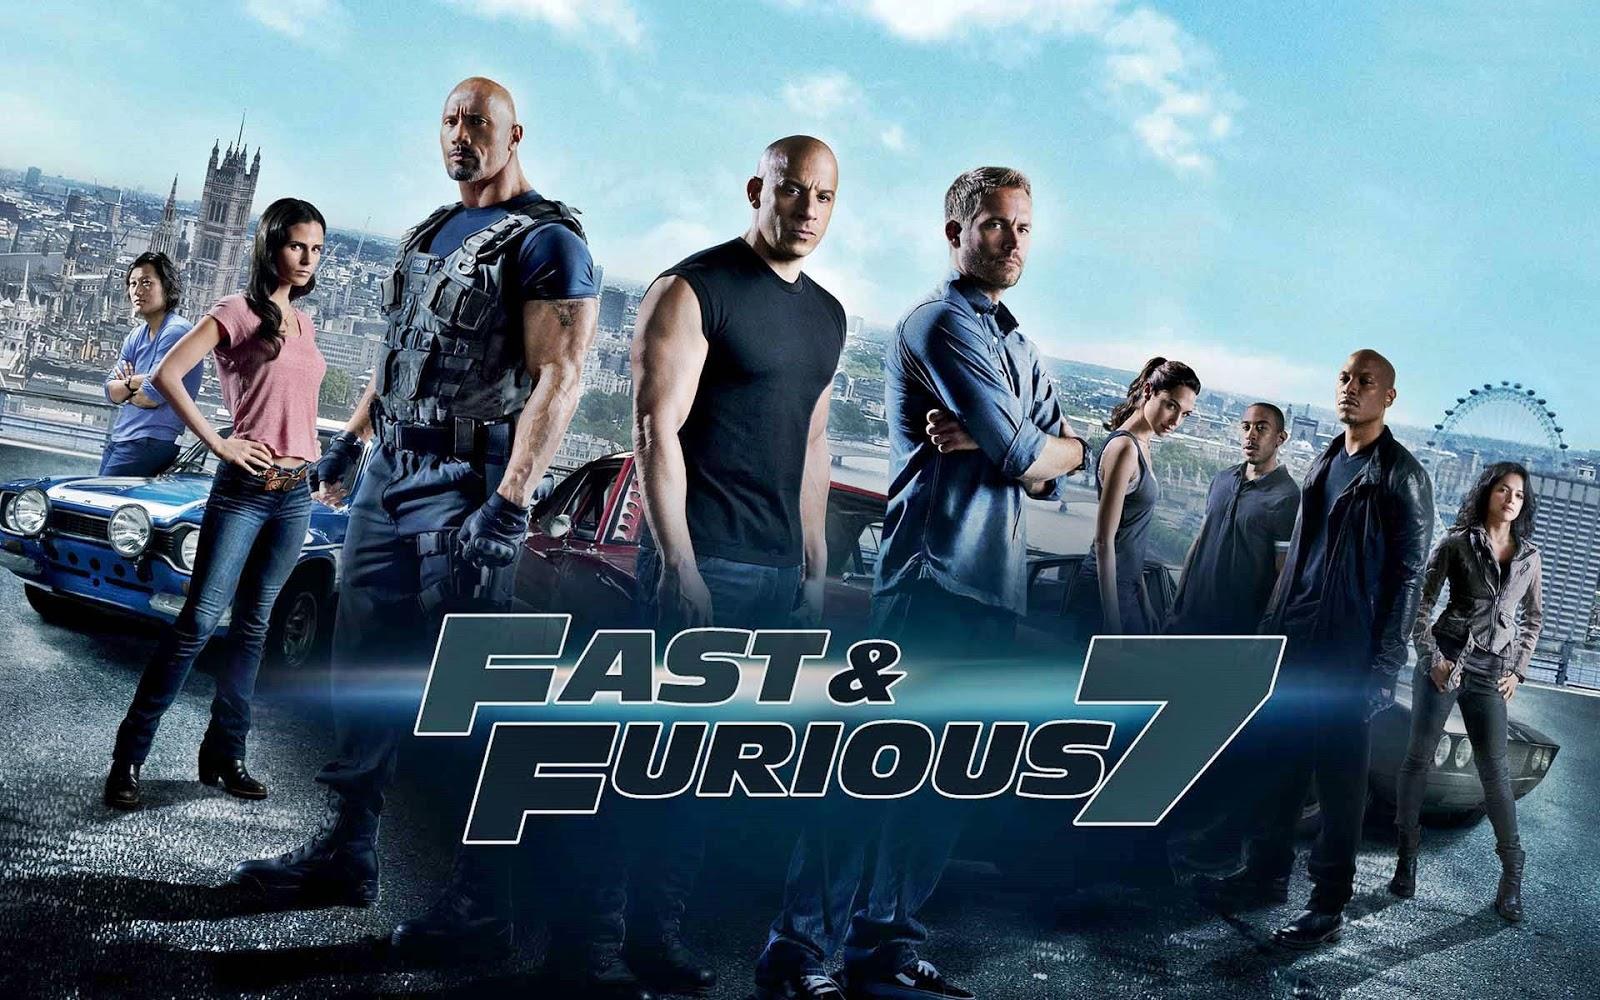 Download Film Fast & Furious 7 (2015) 720p Sub Indonesia ...